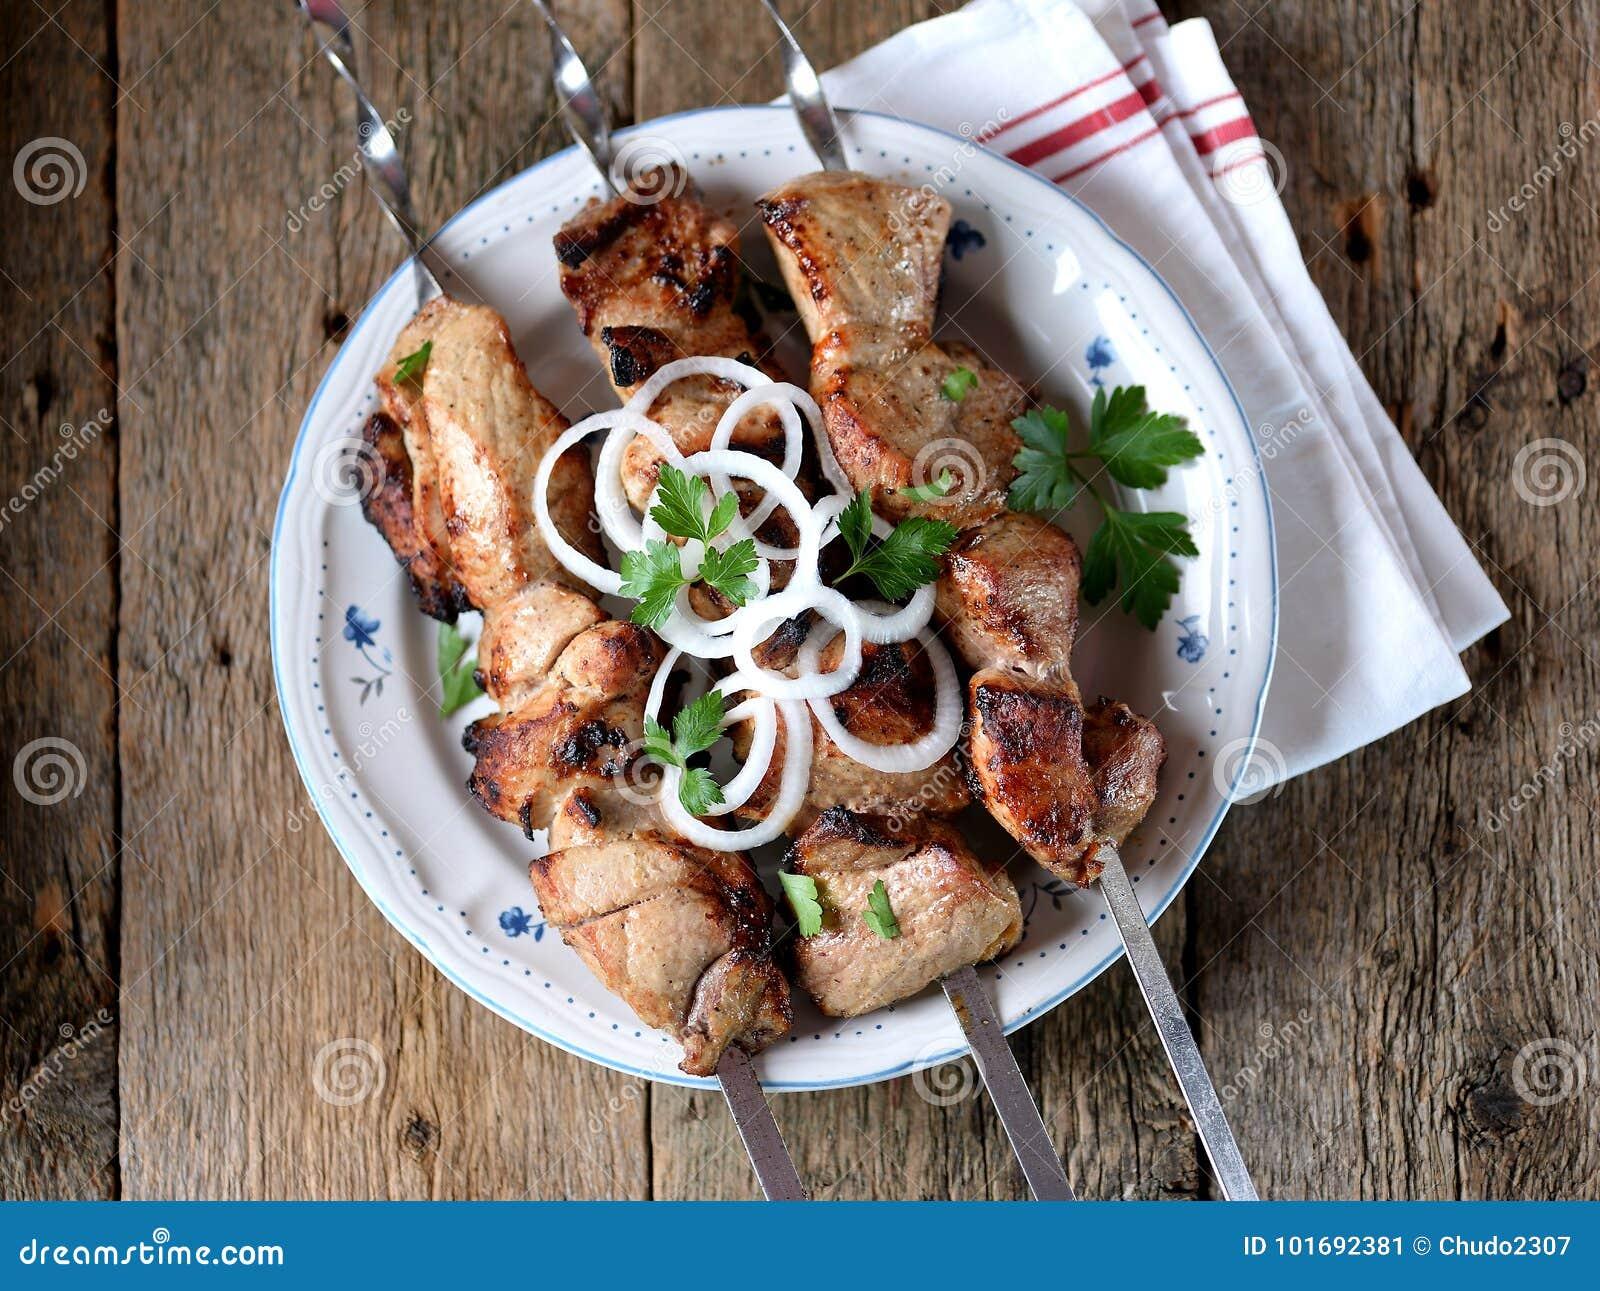 How to pickle pork shish kebab